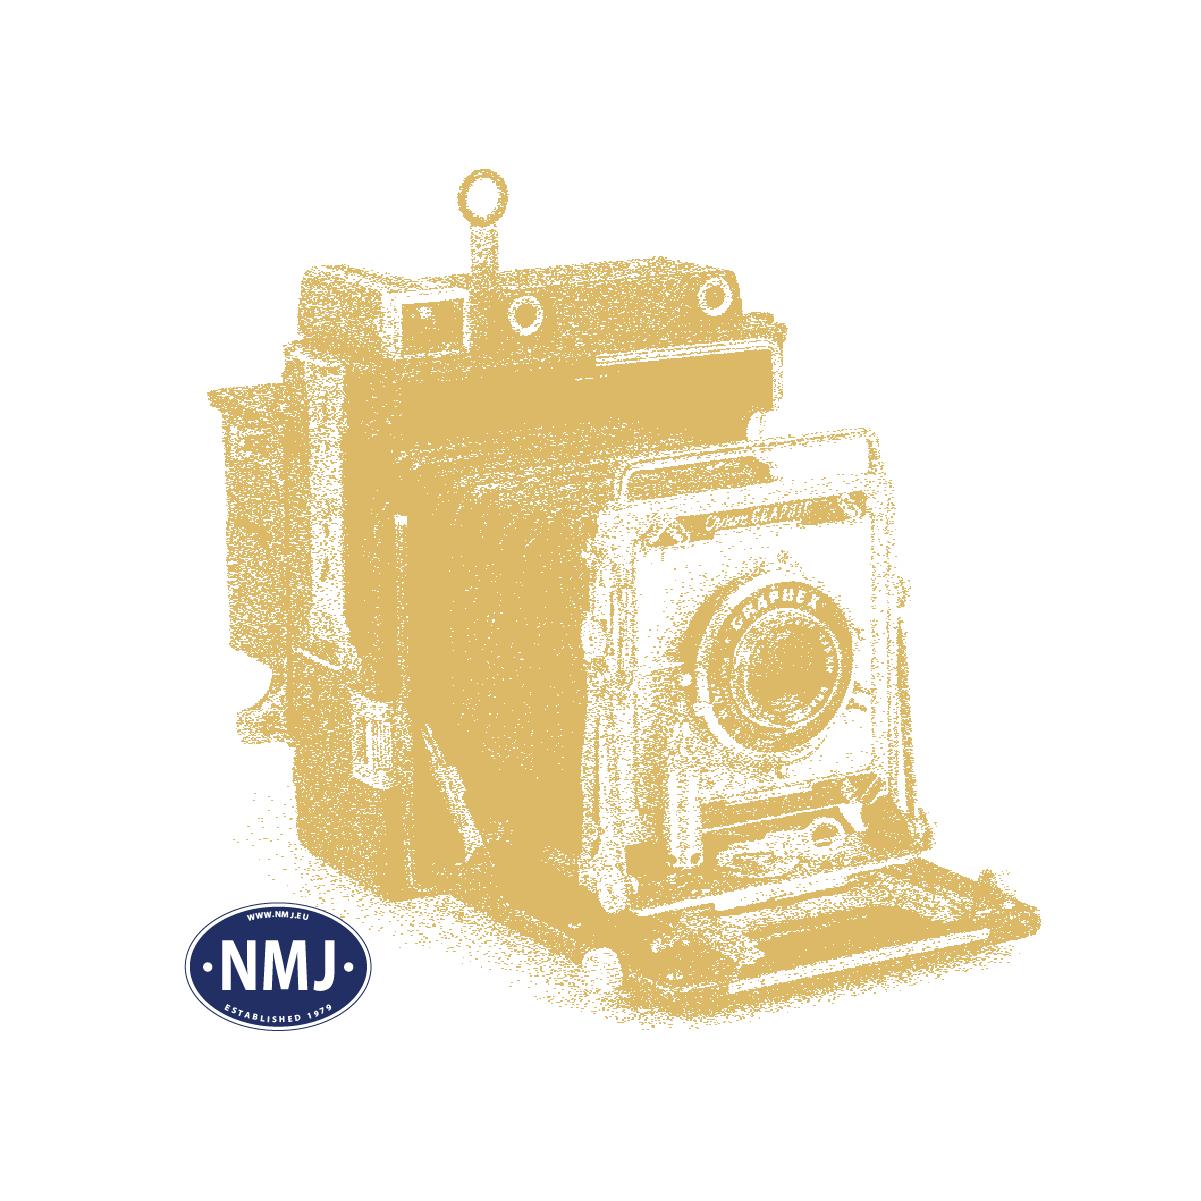 NMJT90205 - nmj-topline-91205-mav-m61-019-dcc Sound